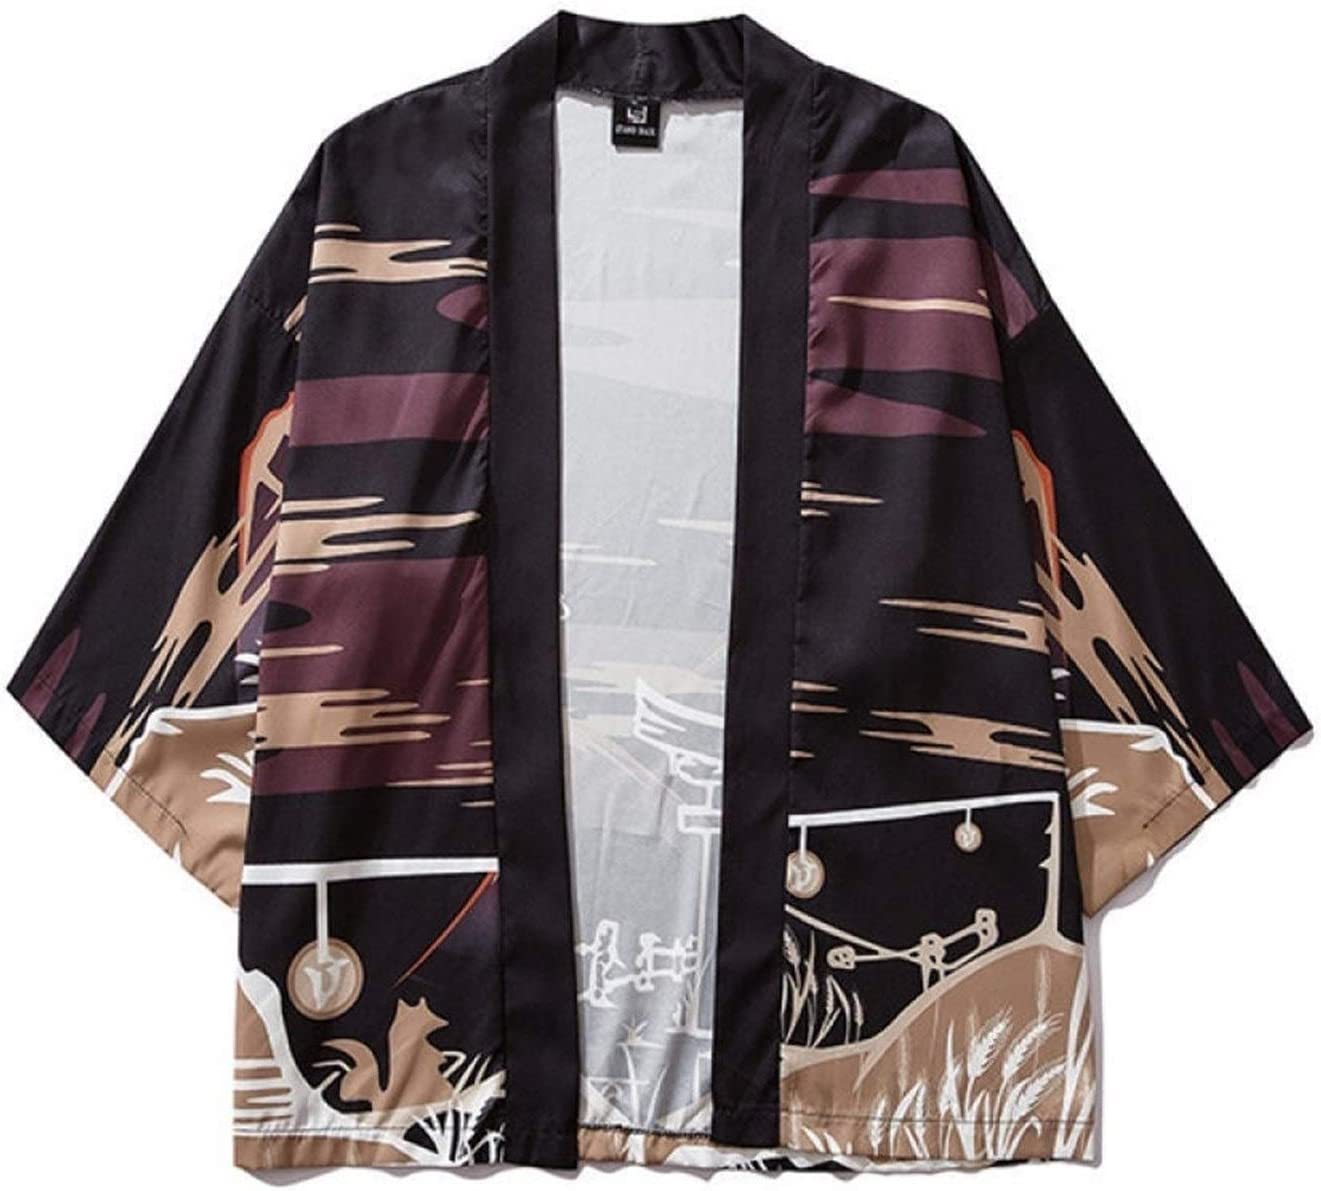 SHUYANshiyu One-Quarter Sleeves Kimono View Print Young Men and Women Open Lining Sun Robe Sun Cape Coat (Color : Color, Size : XXL)